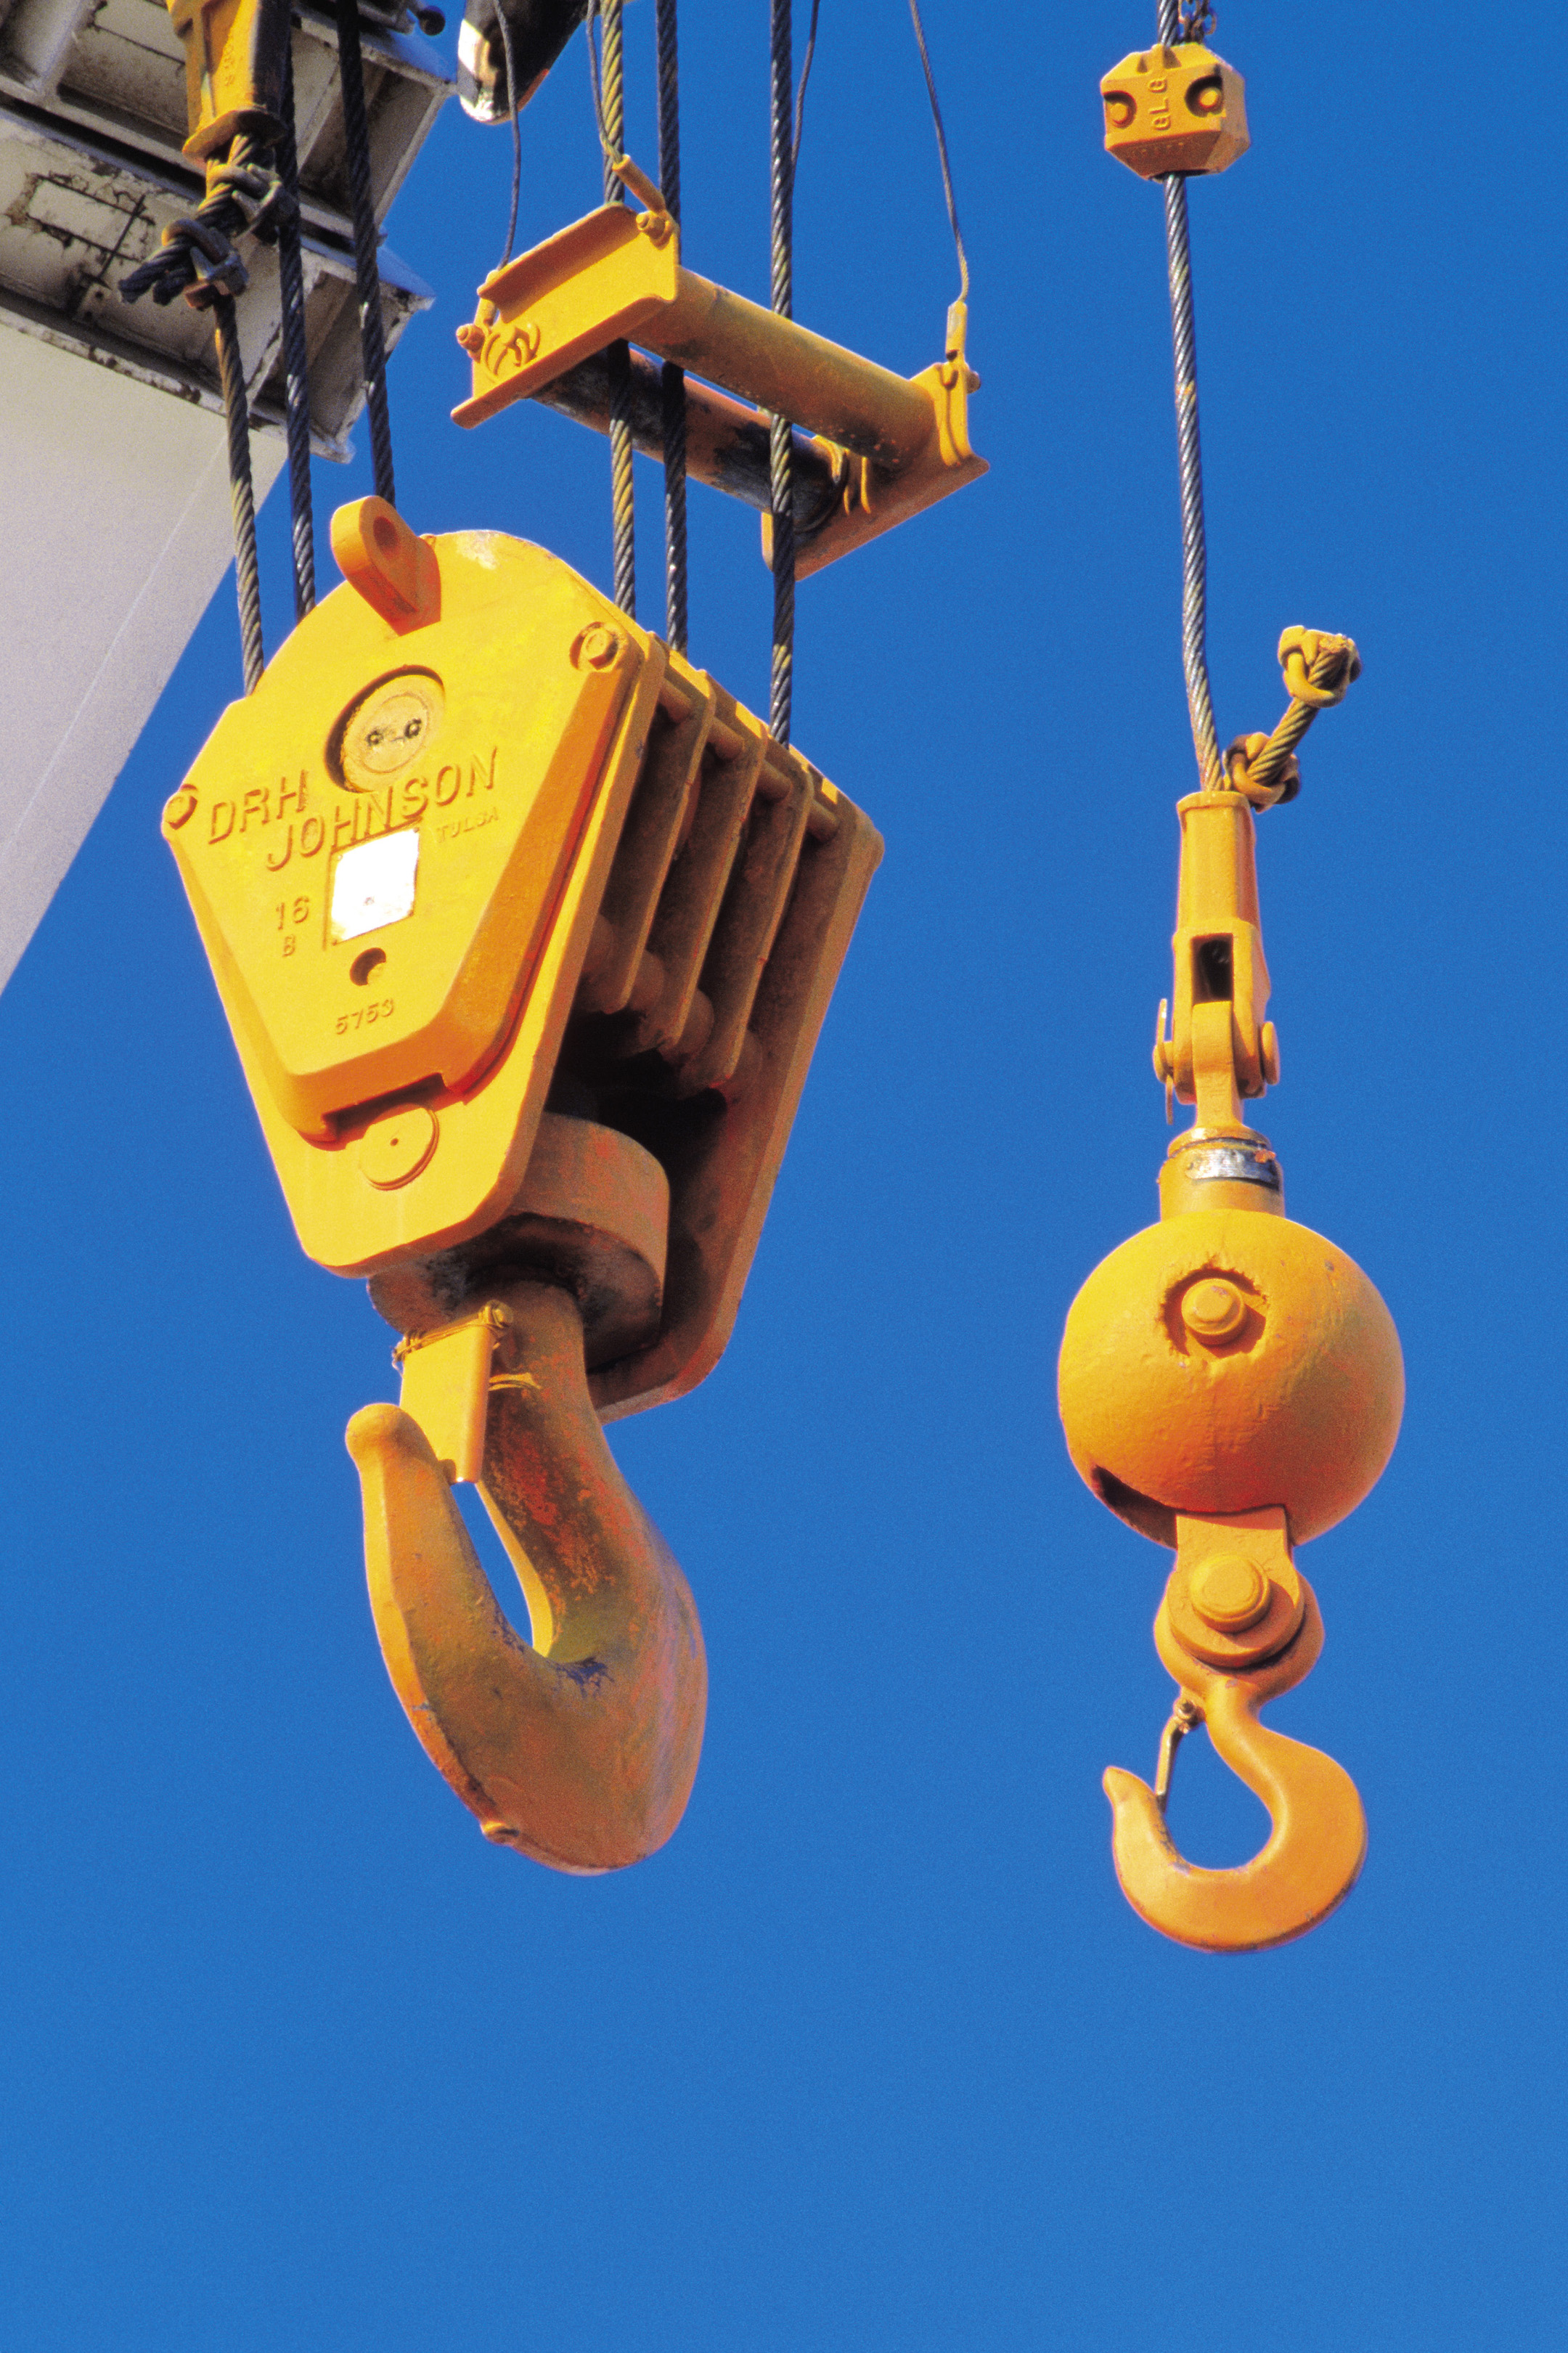 31016_Industrial_crane_KS11757.jpg